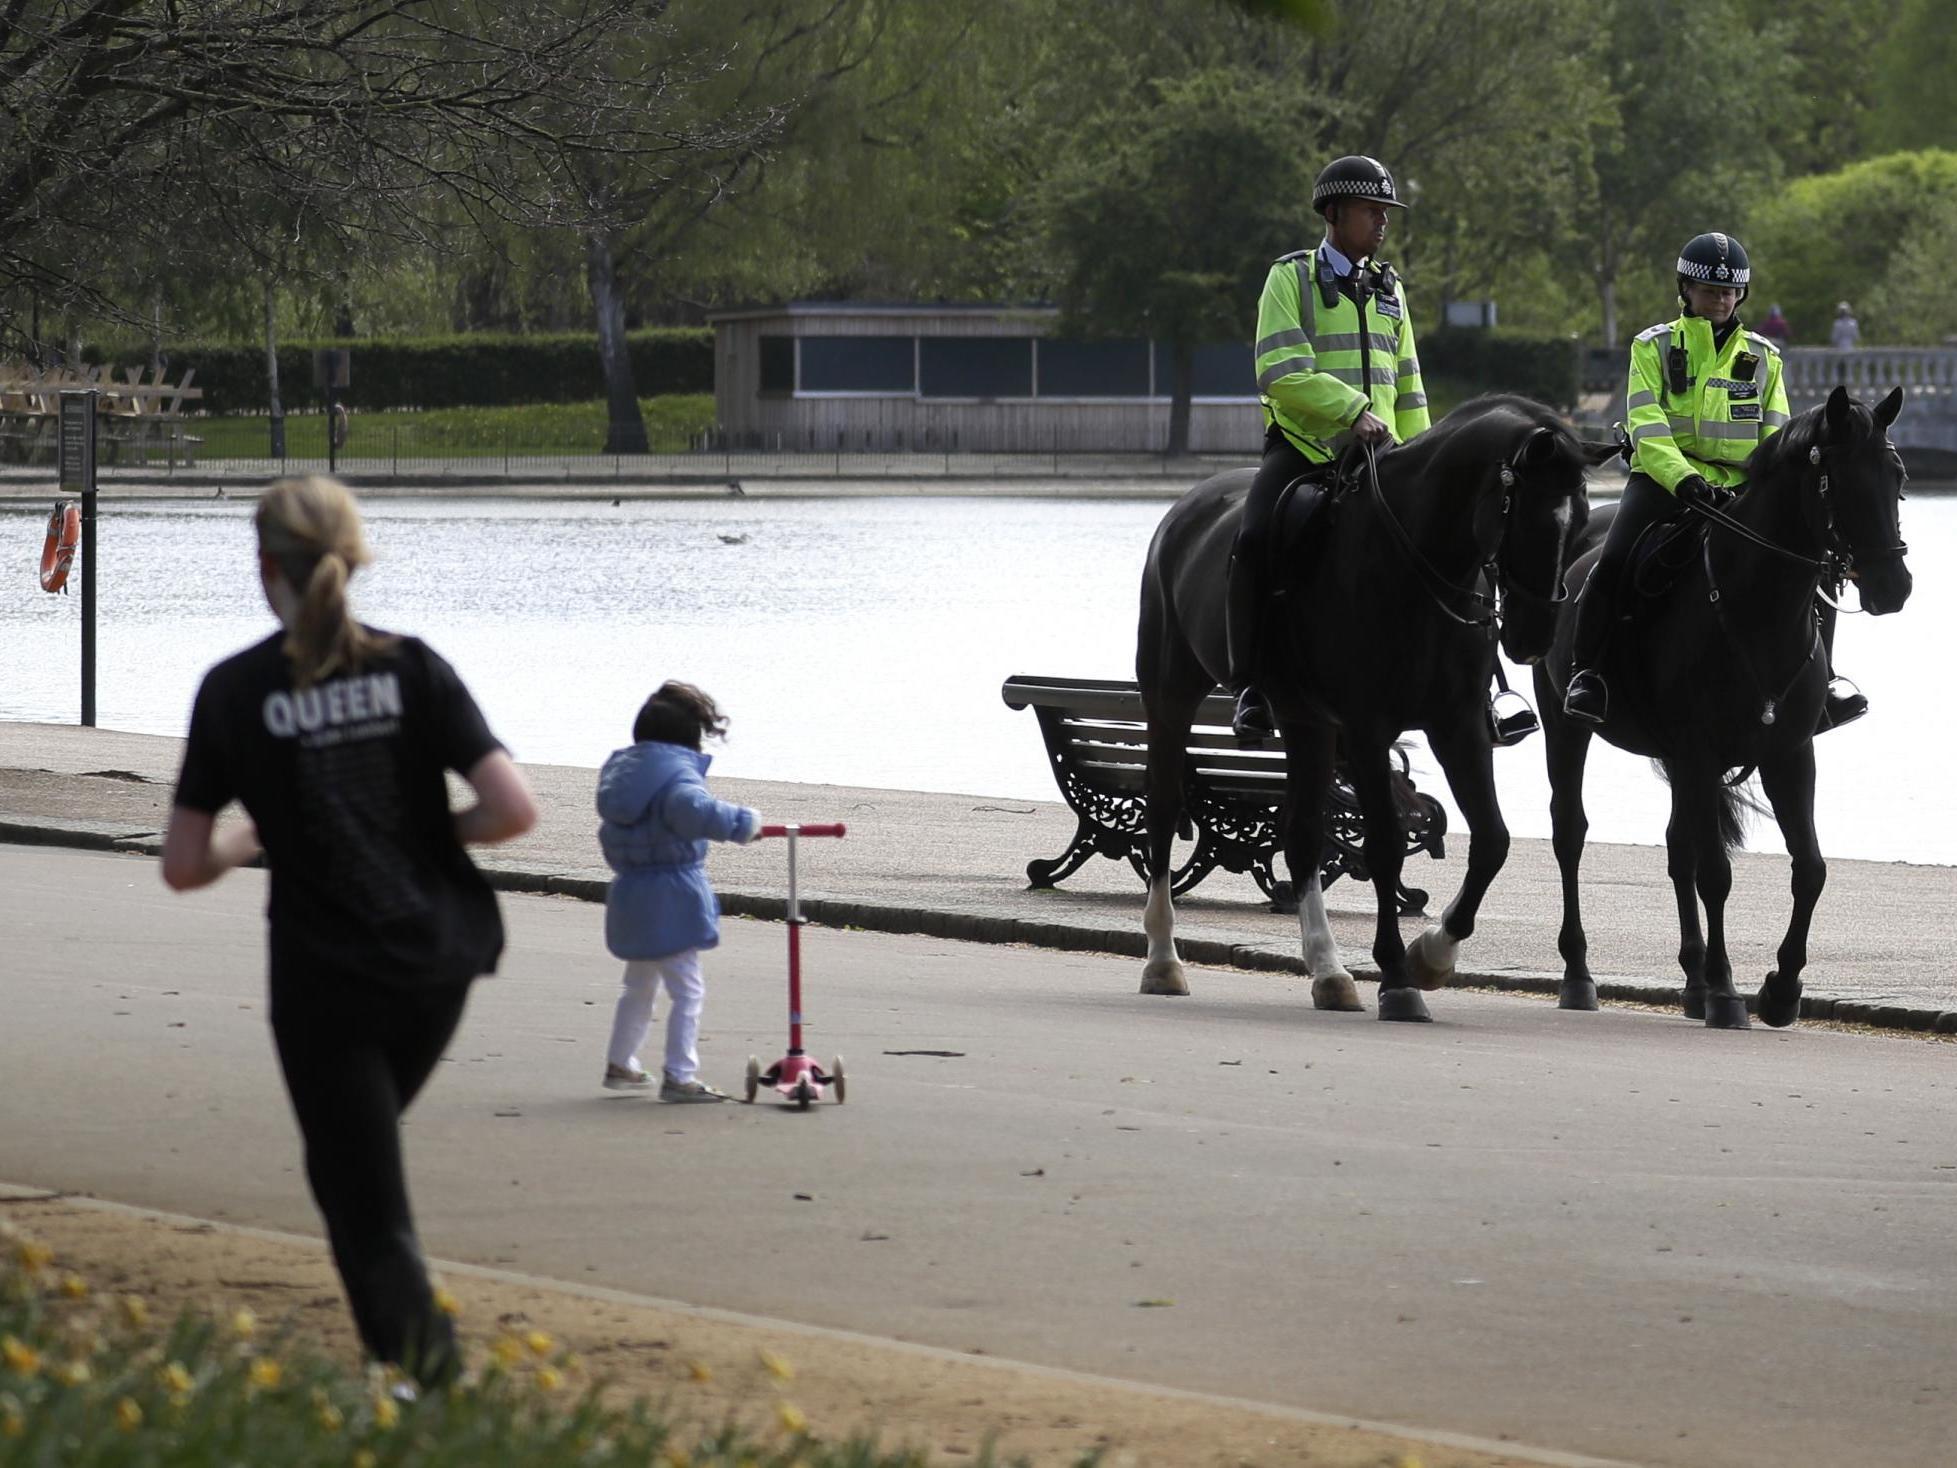 Coronavirus: Parks and graveyards must remain open despite UK lockdown, government says thumbnail